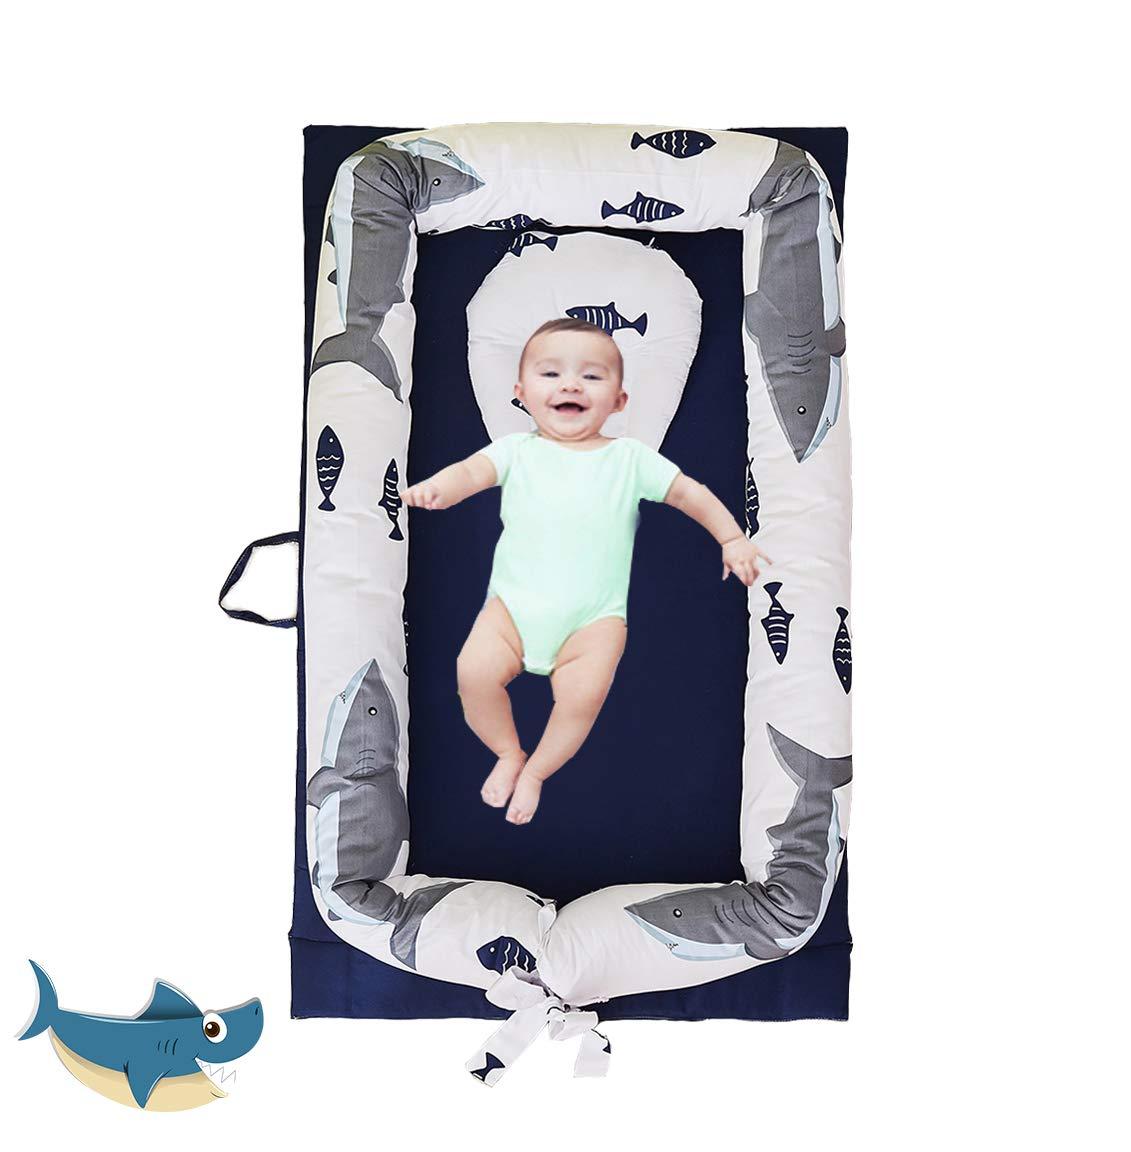 Brandream Baby Bassinet for Bed Navy,Blue Shark Newborn Baby Lounger, Infant Sleeping Nest/Pods Breathable 100% Cotton Multifunctional Baby Nest, Portable Crib for Bedroom/Travel (0-24 Months)